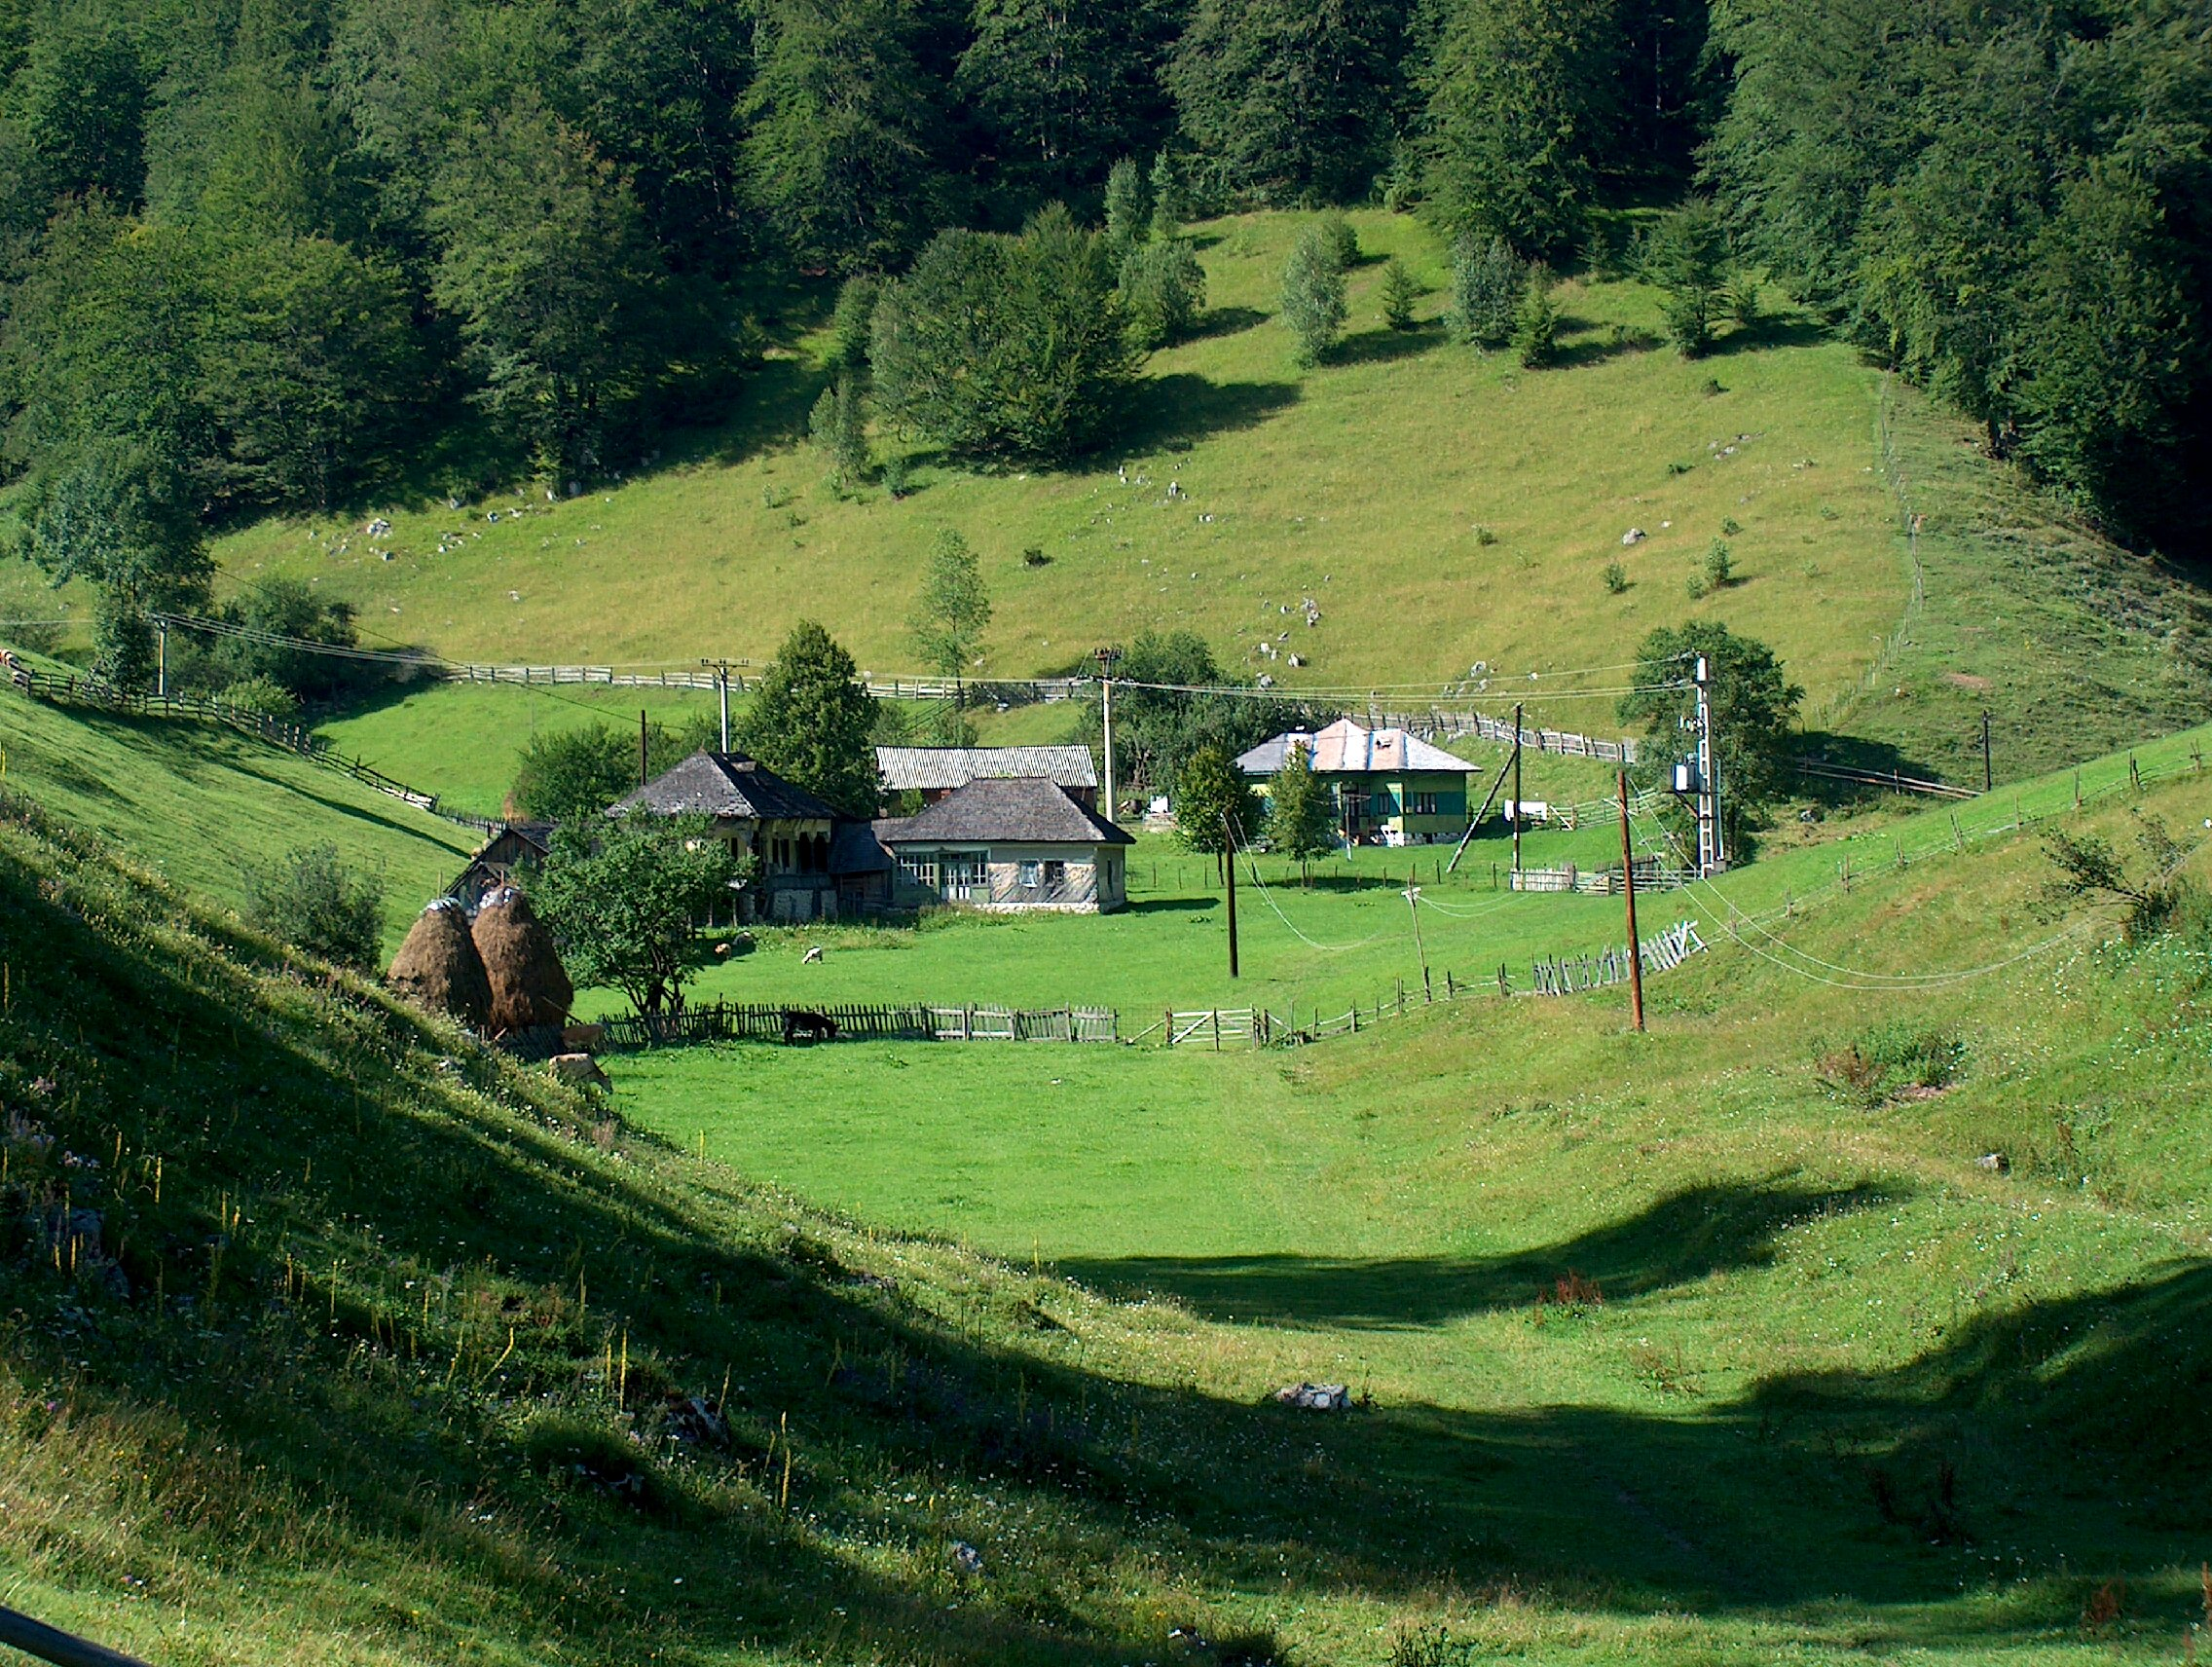 Romanian landscape blume language and culture learning for Romania landscape